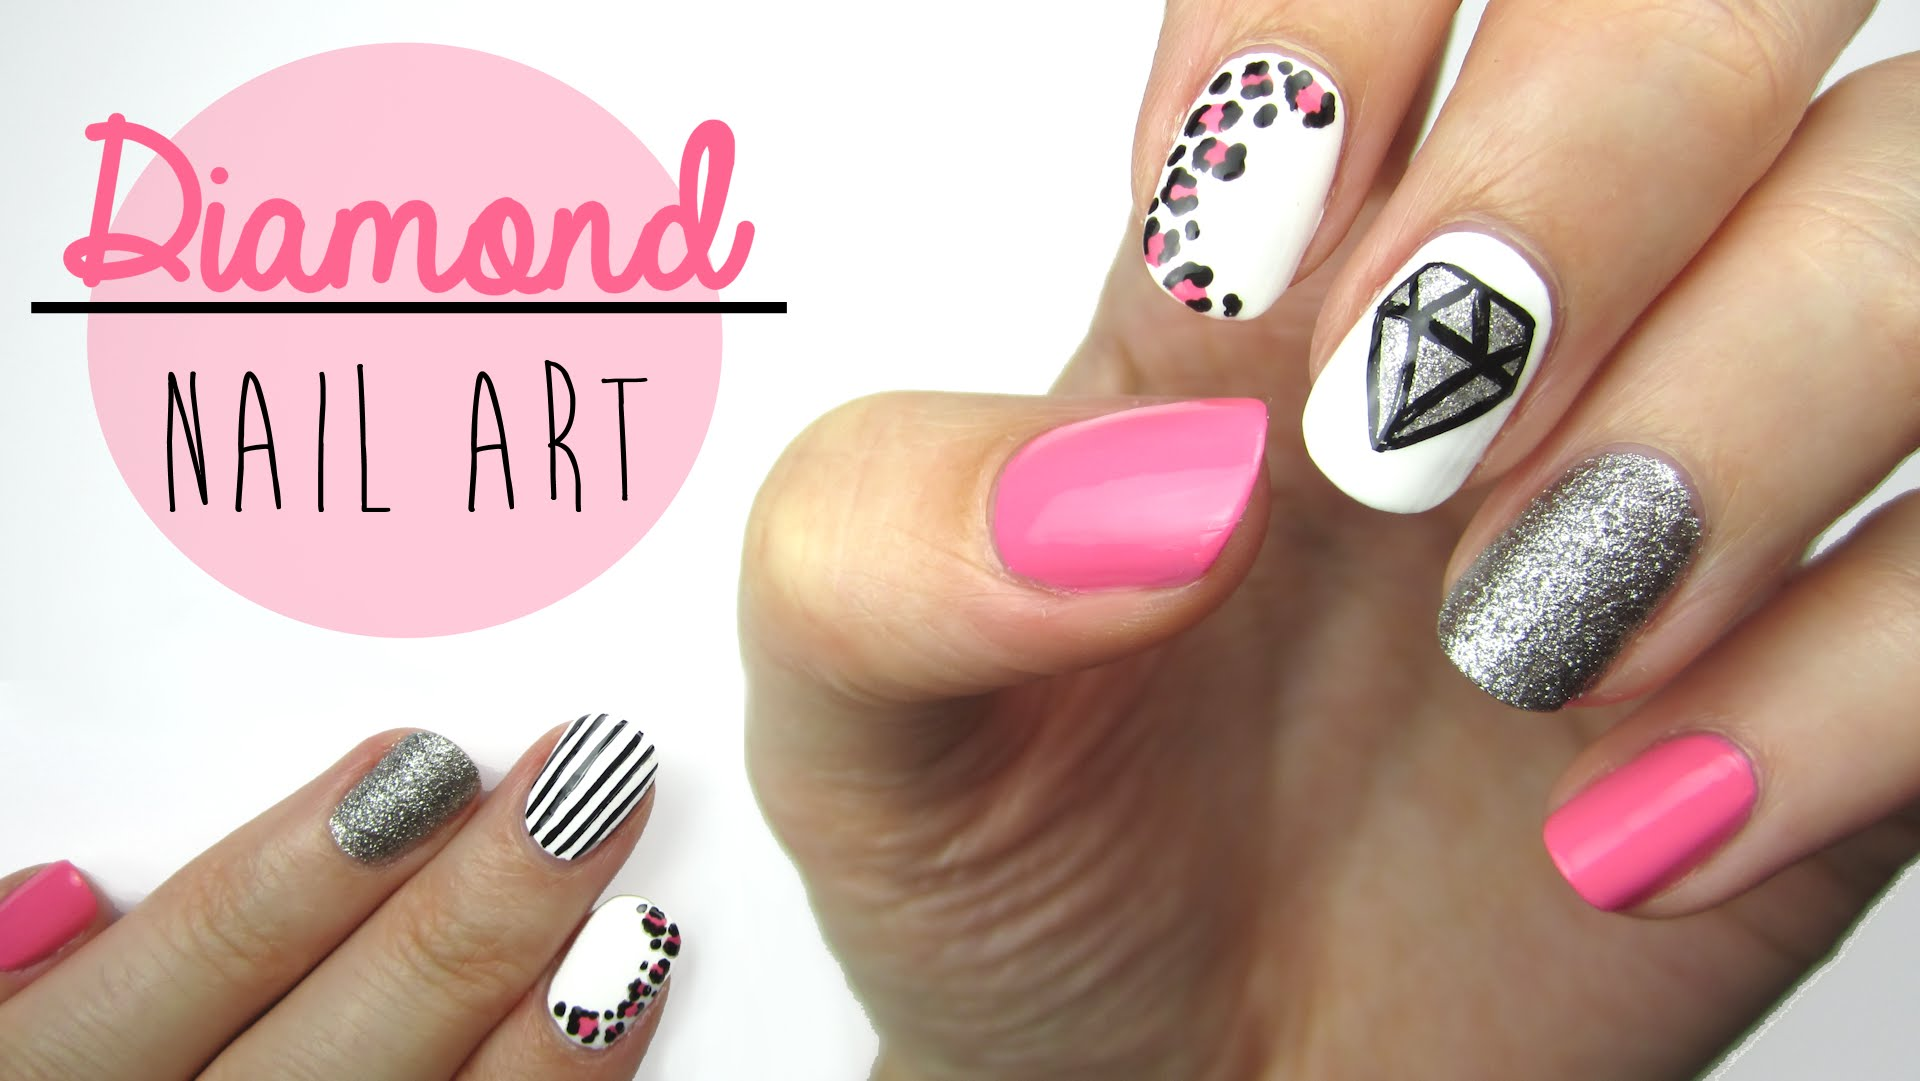 Dorable Diamond Nails Design Motif - Nail Art Ideas - morihati.com